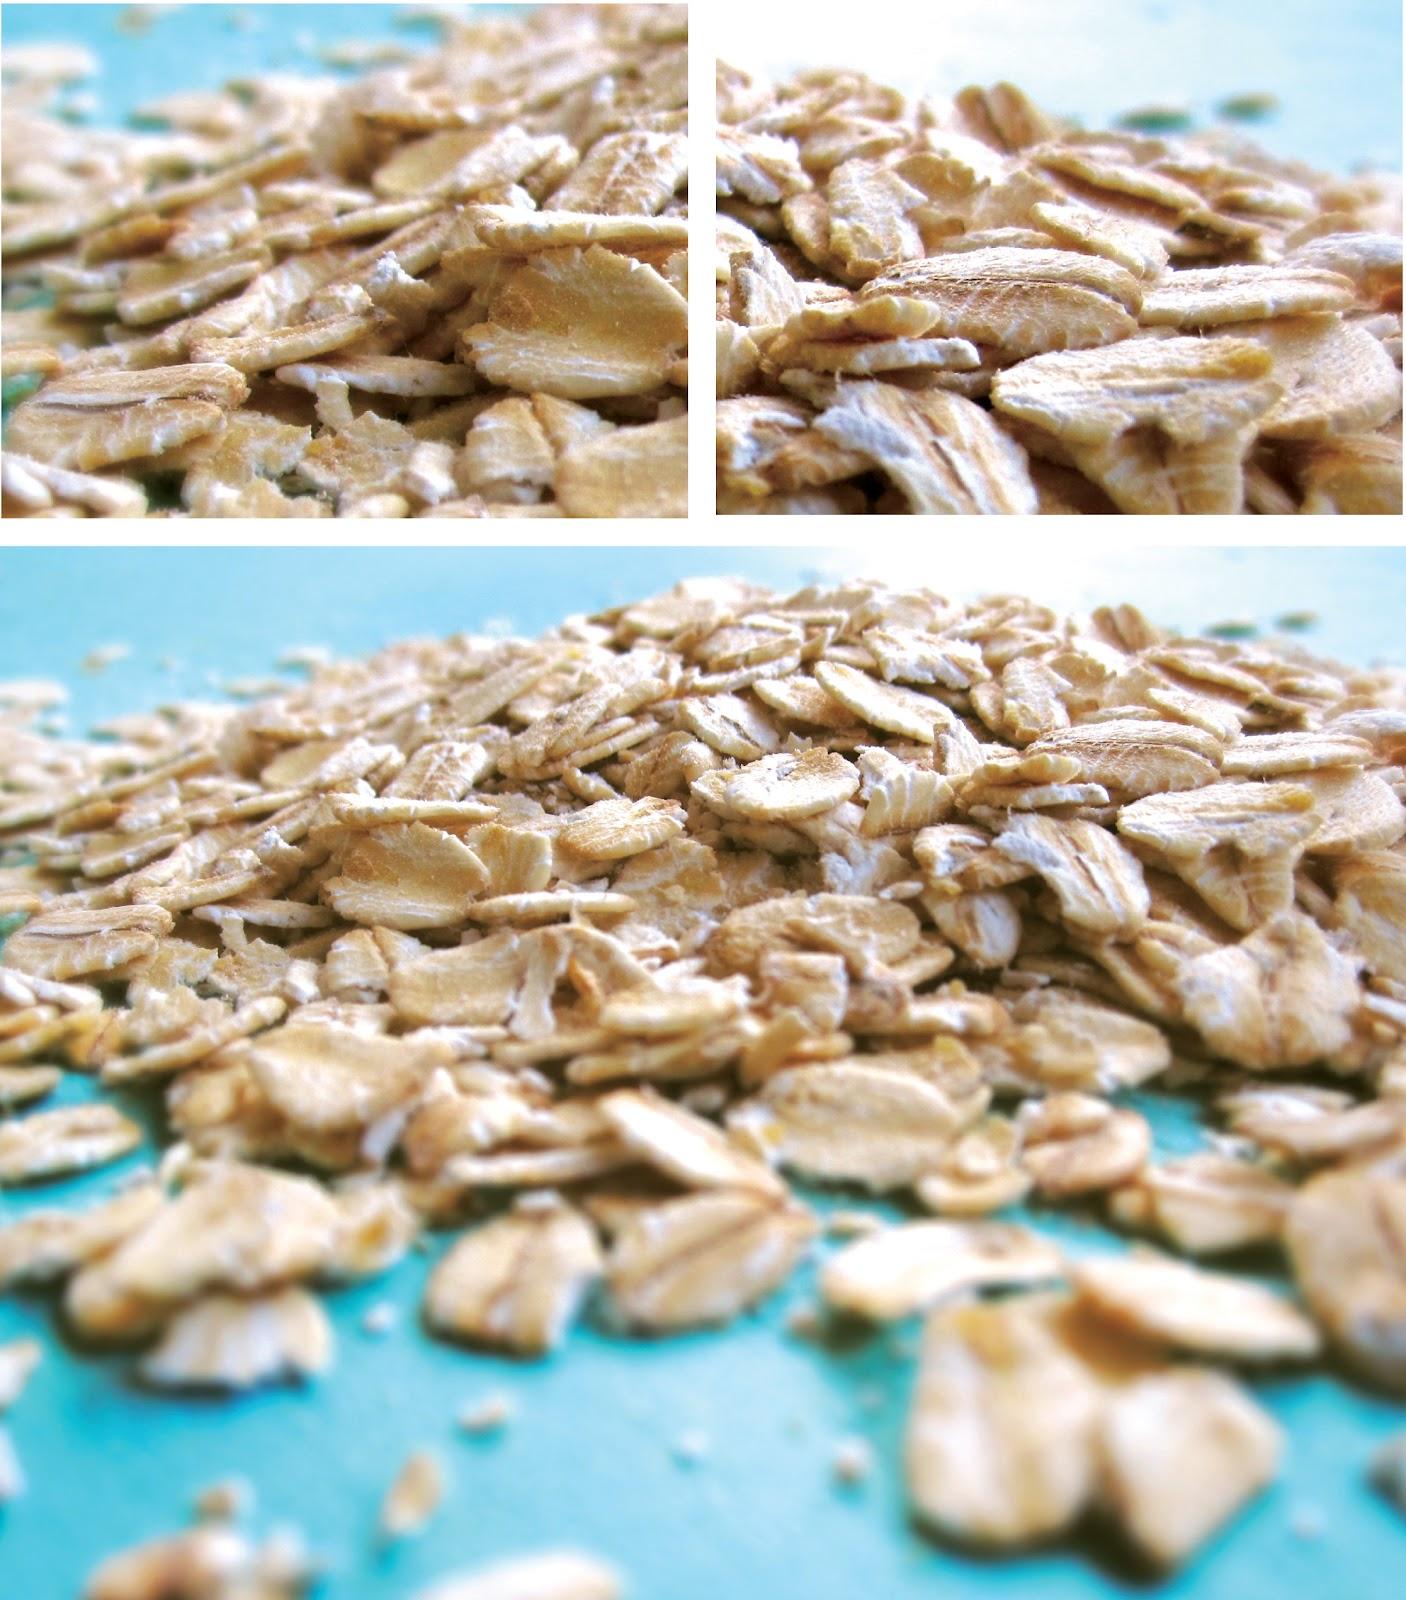 The Green Ritual Raw Oatmeal Porridge With Peaches